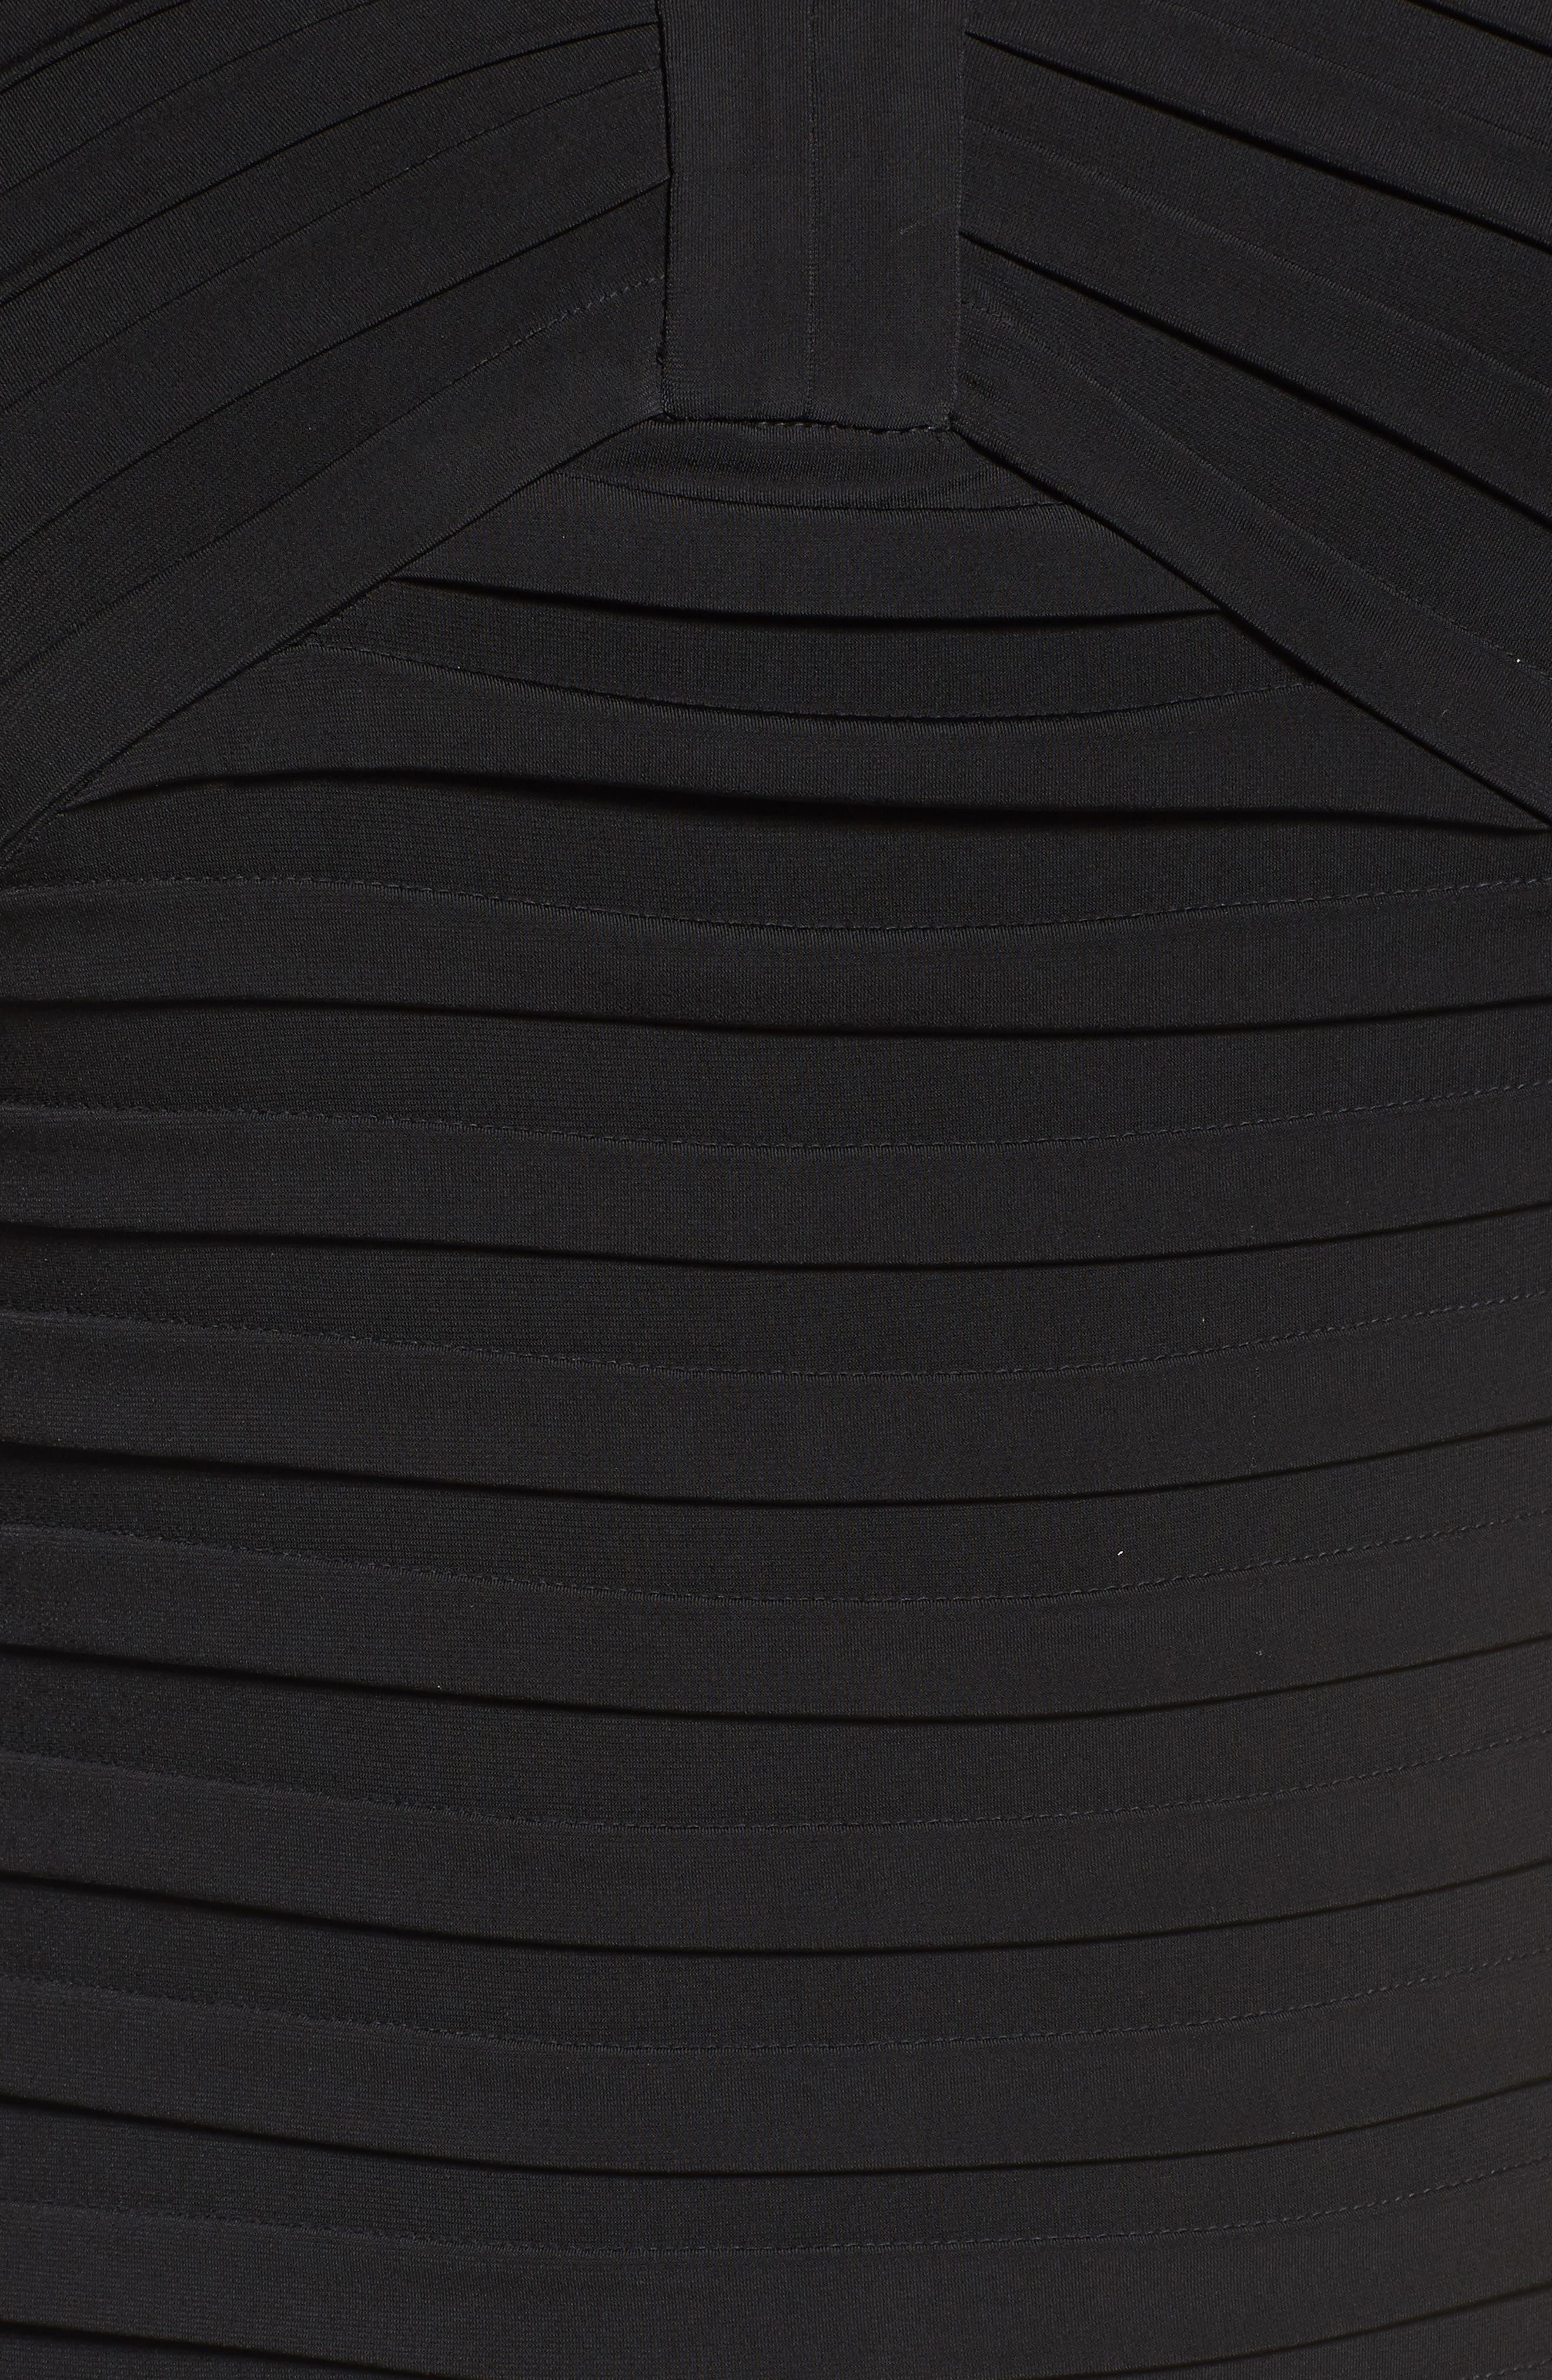 Shutter Pleat Jersey Skeath Dress,                             Alternate thumbnail 6, color,                             BLACK